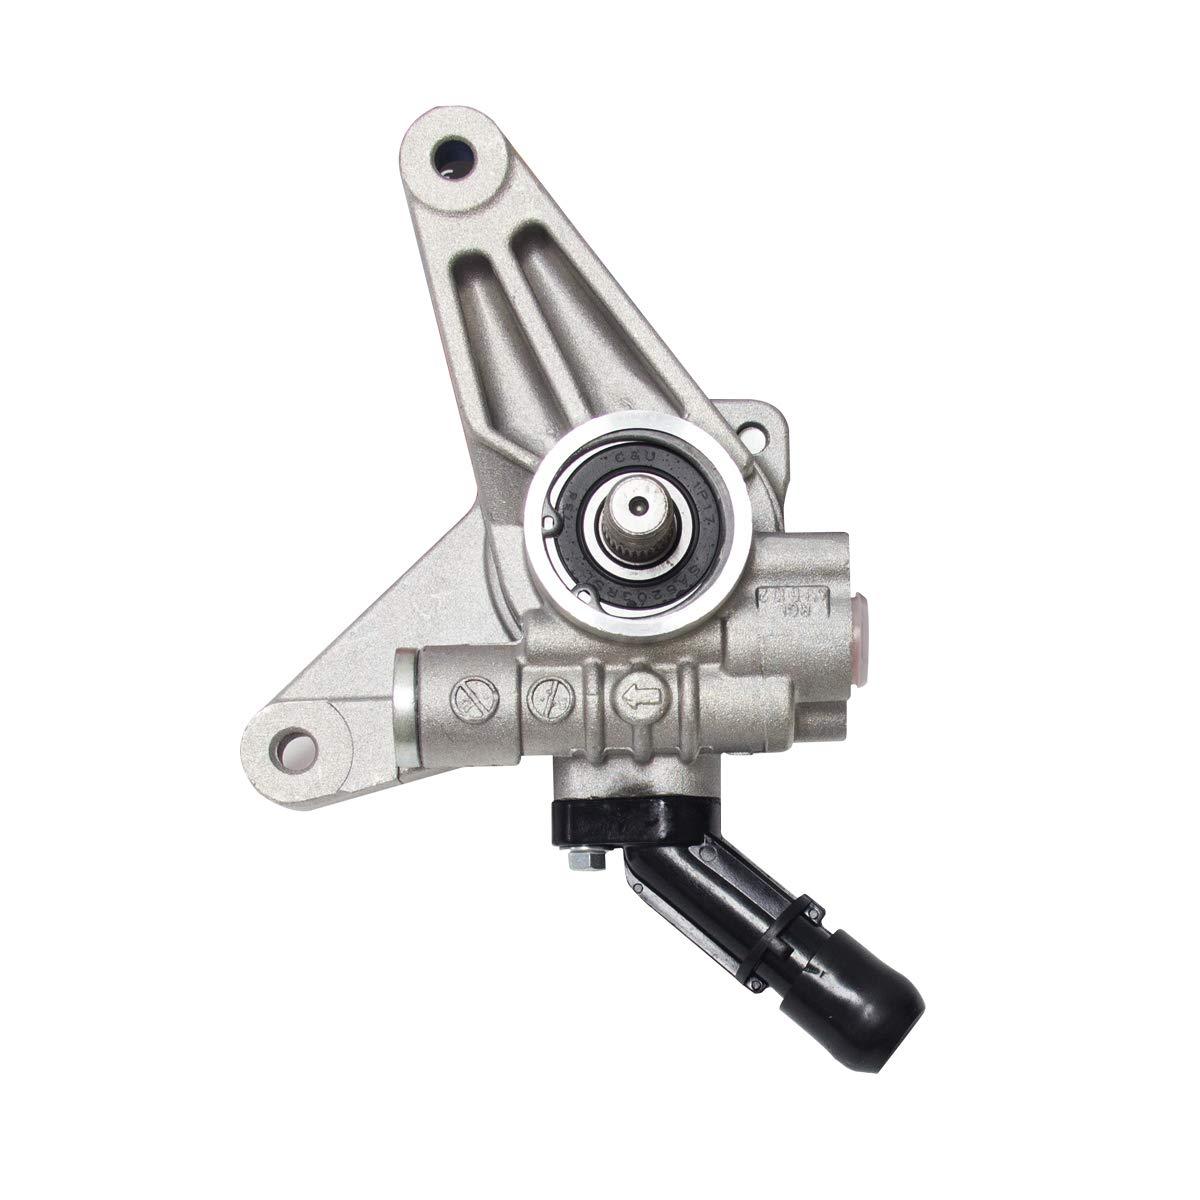 Honda Odyssey 2005-2010 Acura MDX 2007-2013 Replace 56110-RGL-A03 56110-PVJ-A01 56110-RYE-A02 Wisamic Power Steering Pump for Honda Pilot 2005-2008